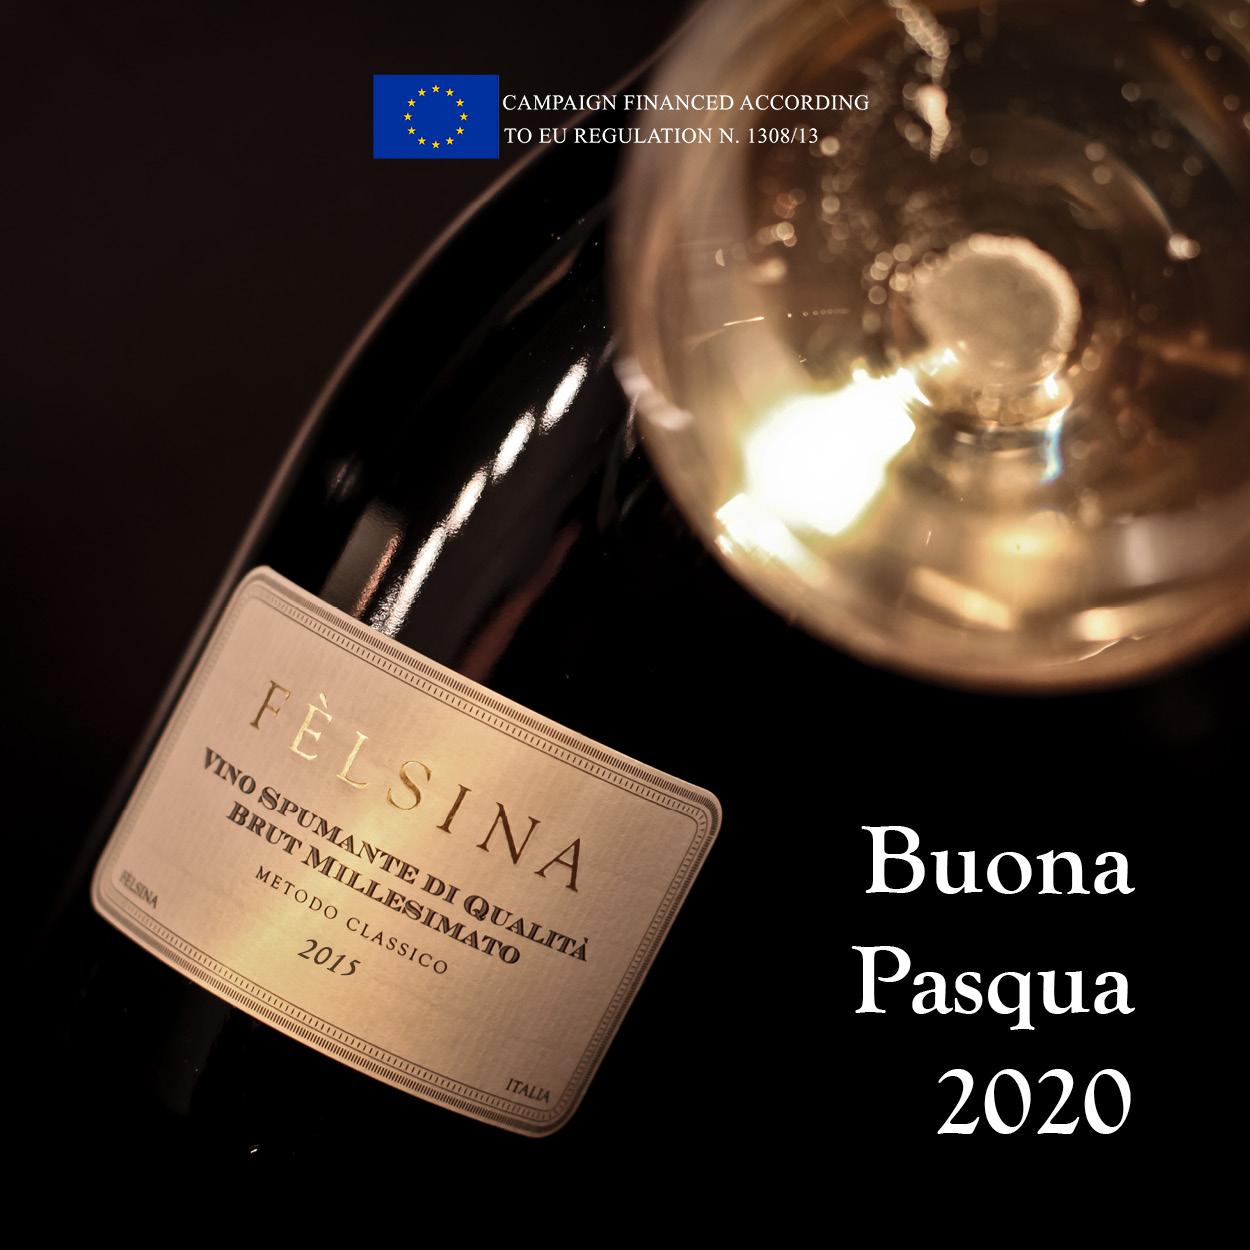 pasqua_2020_ig_2015millesimato-felsina